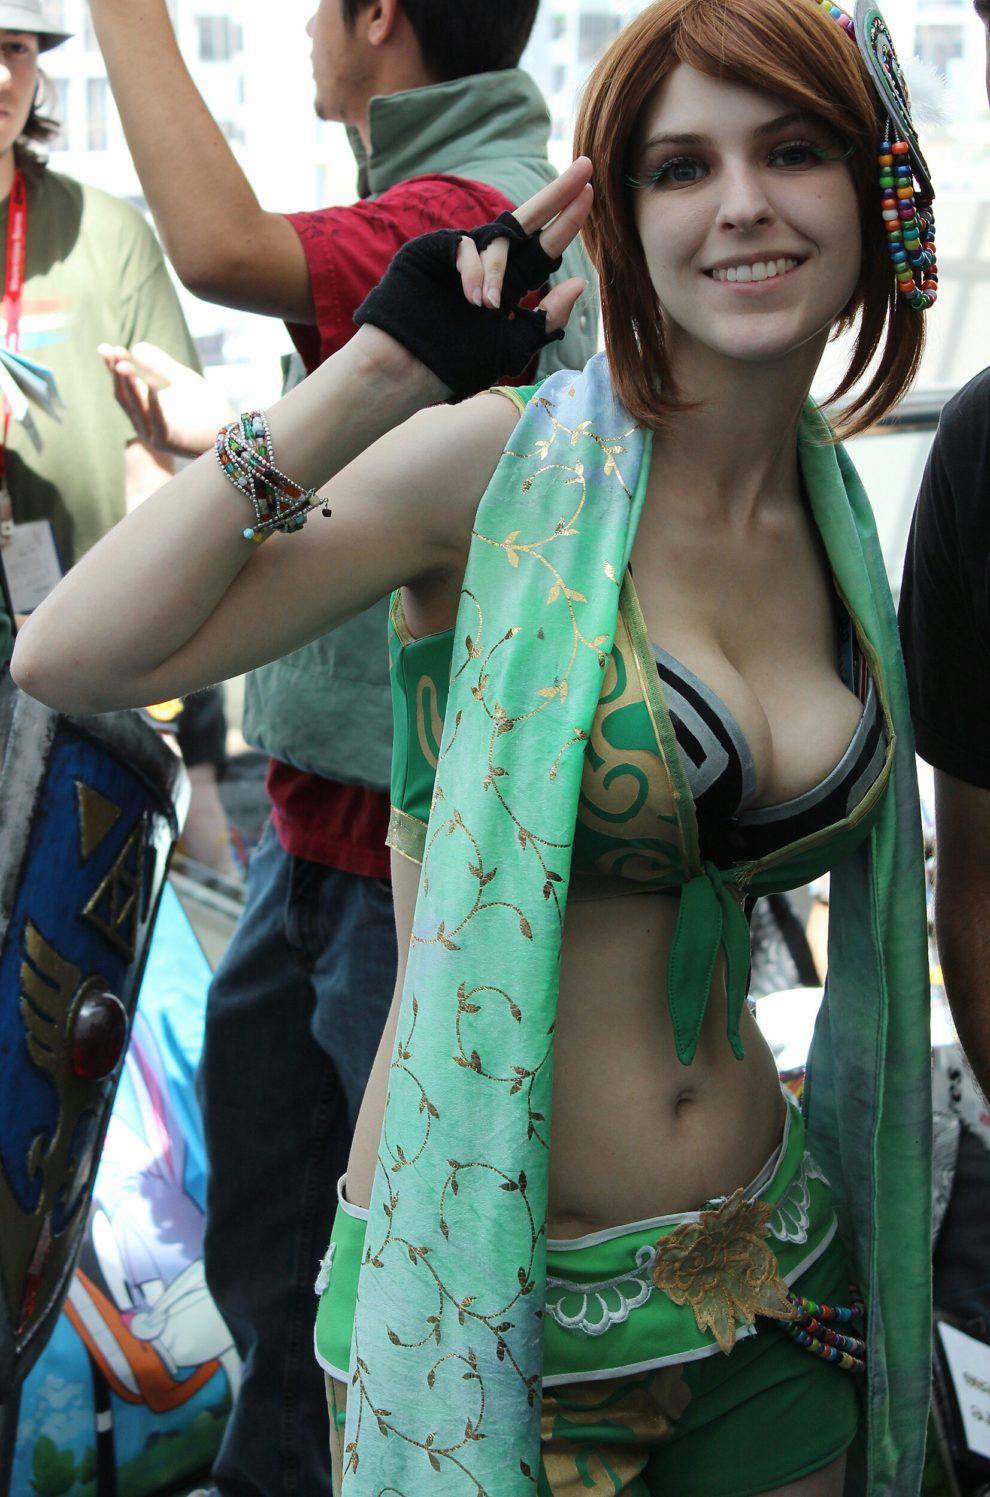 Dynasty warrior cosplay porn adult scenes